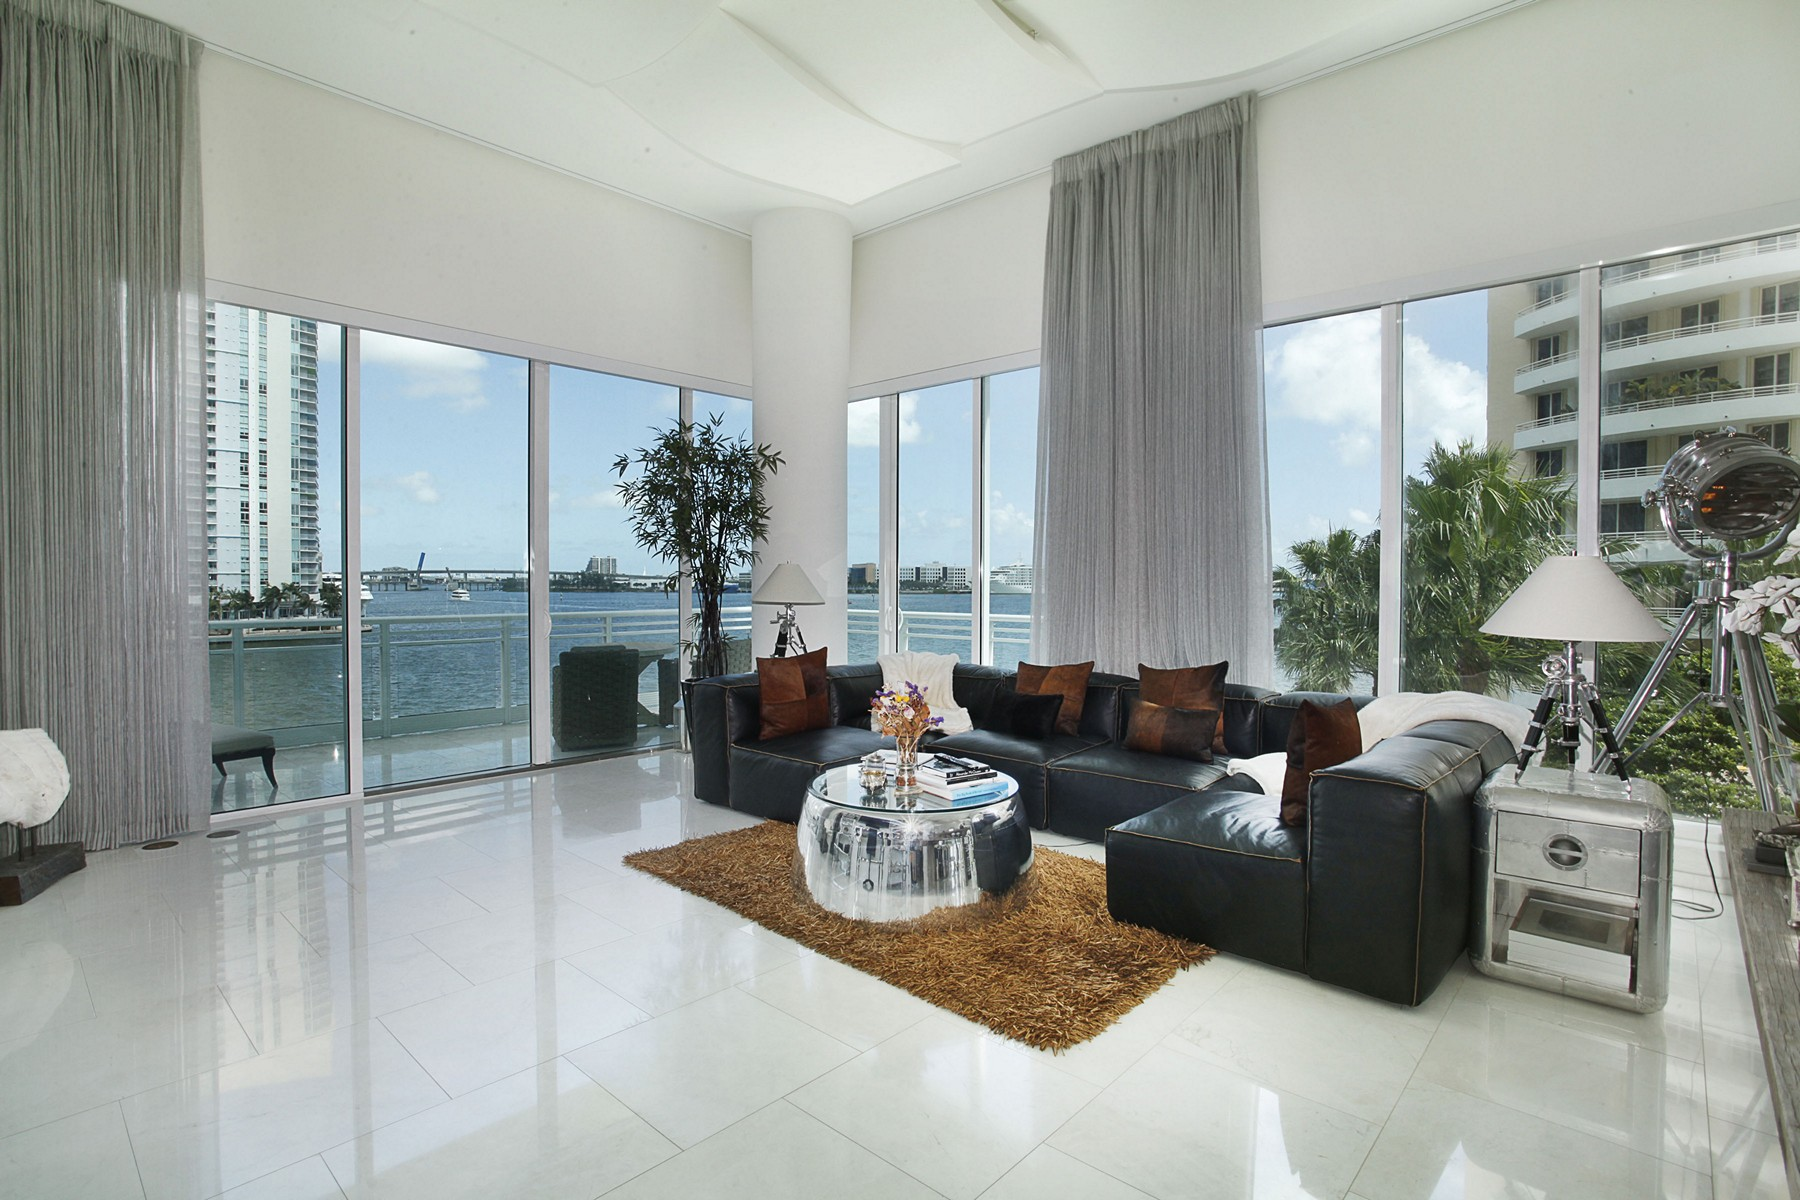 Condominium for Sale at 900 Brickell Key BL #403/503 900 Brickell Key Bl 4/503 Miami, Florida, 33131 United States